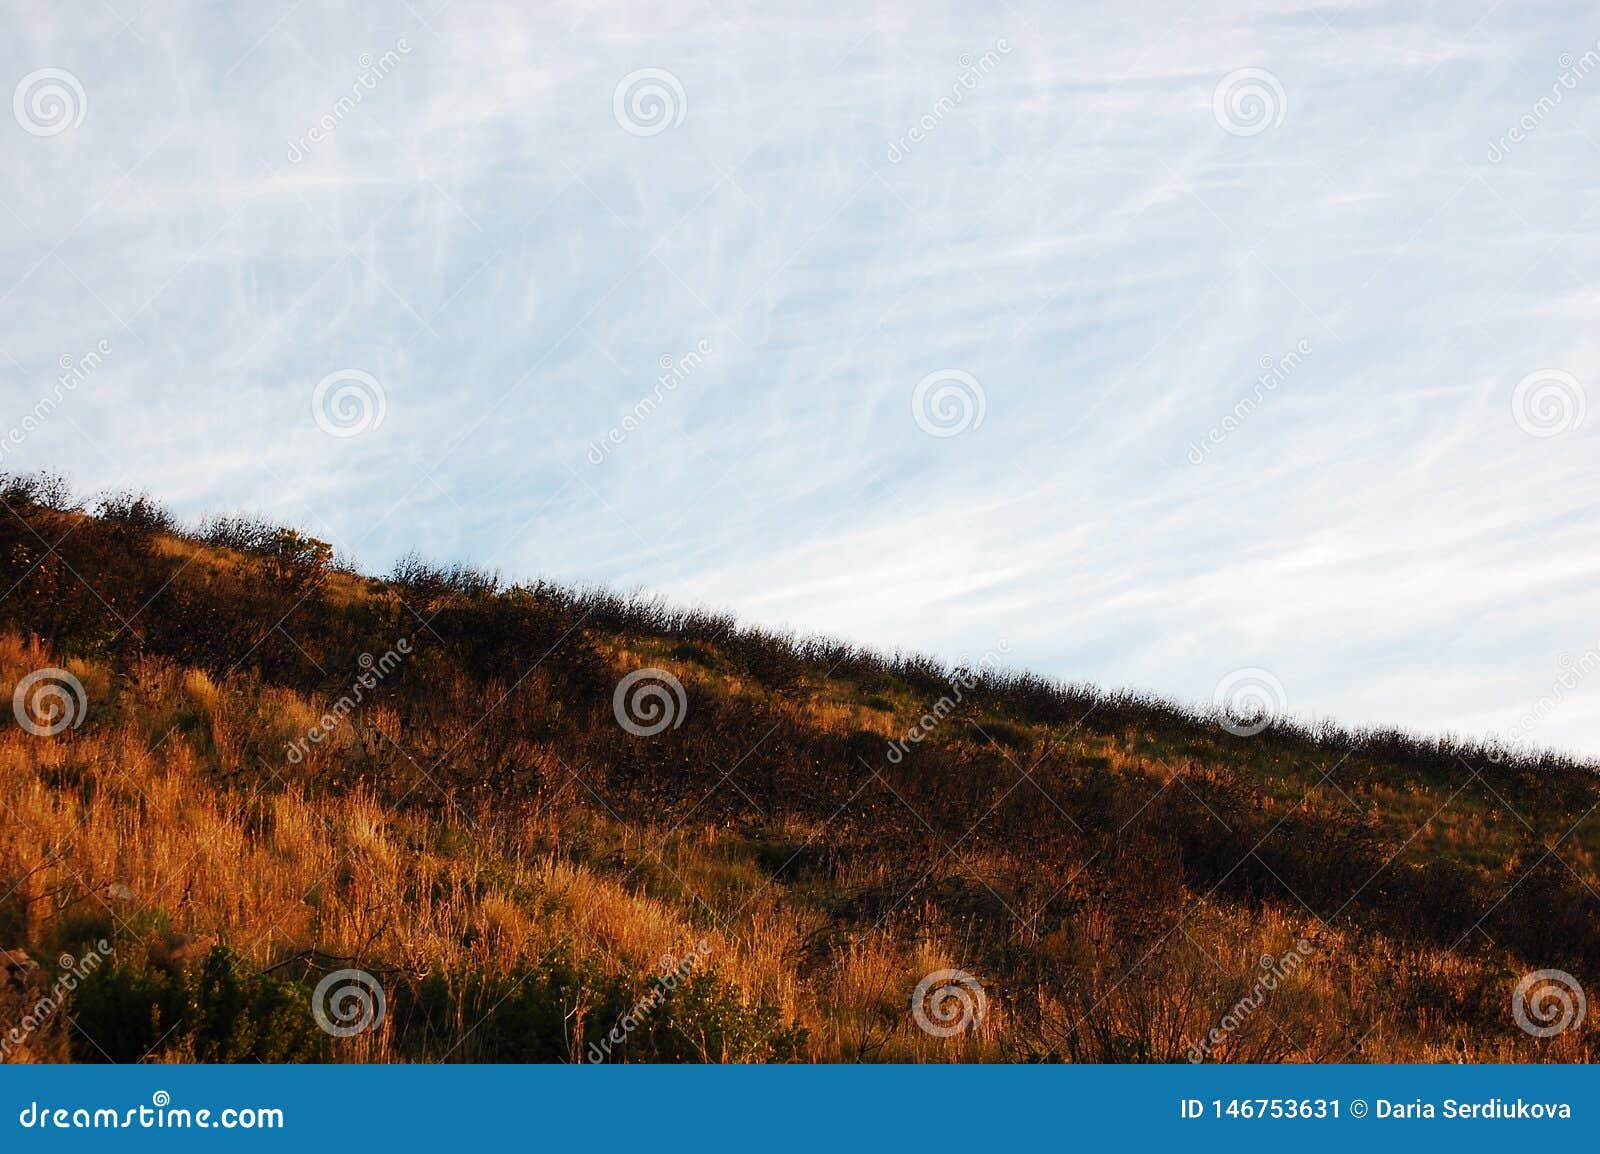 Orange wild grass on Table Mountain South Africa